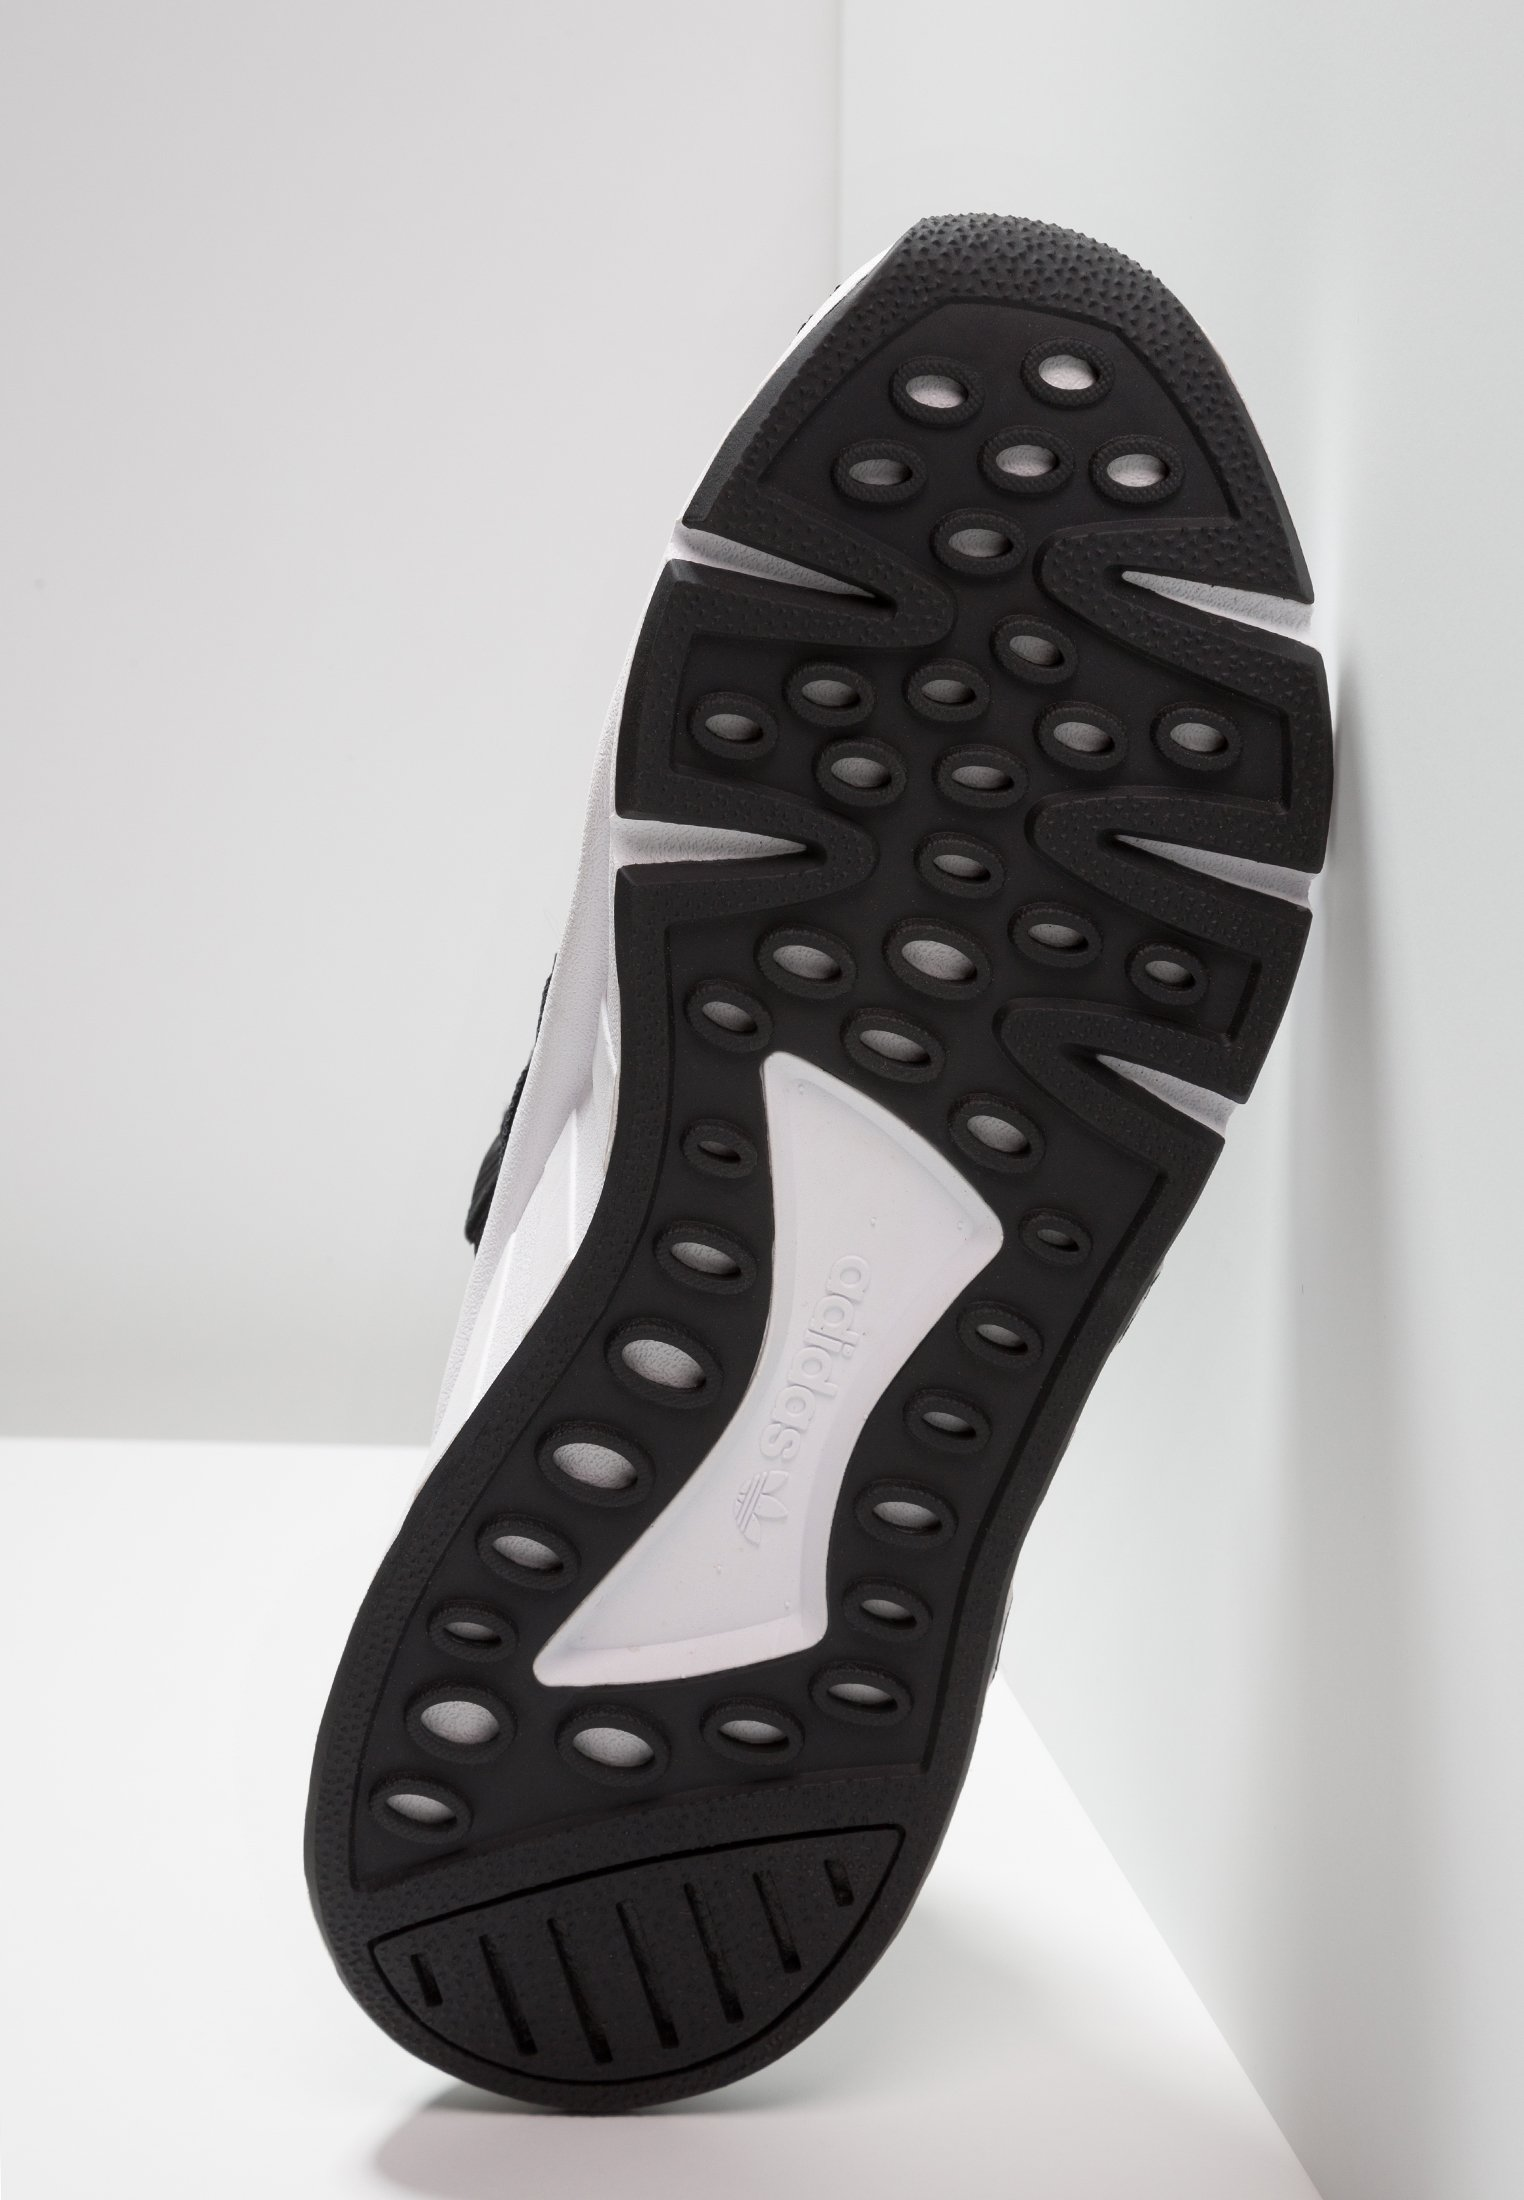 Adidas White Support Originals MidBaskets Basses greyfive footwear Eqt Coreblack ucT3l1JFK